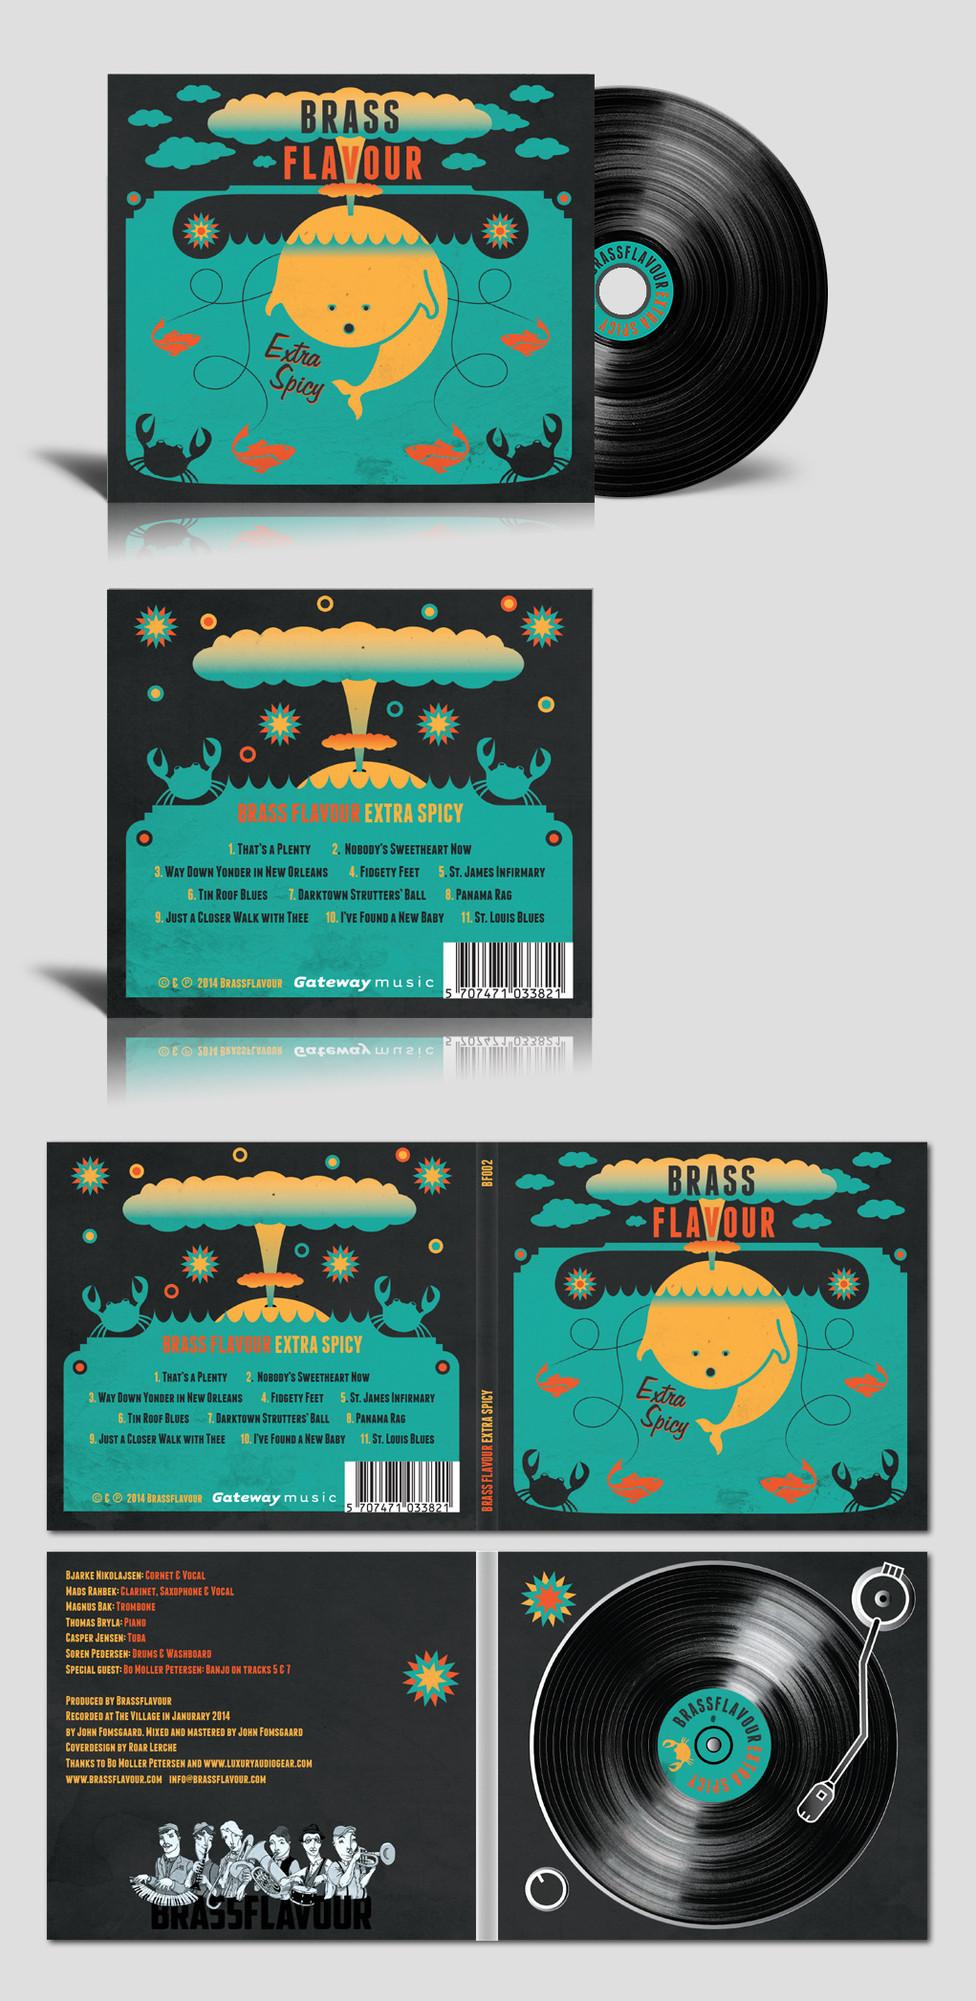 BRASSFLAVOUR-COVER-w800px-Roar-Lerche_10